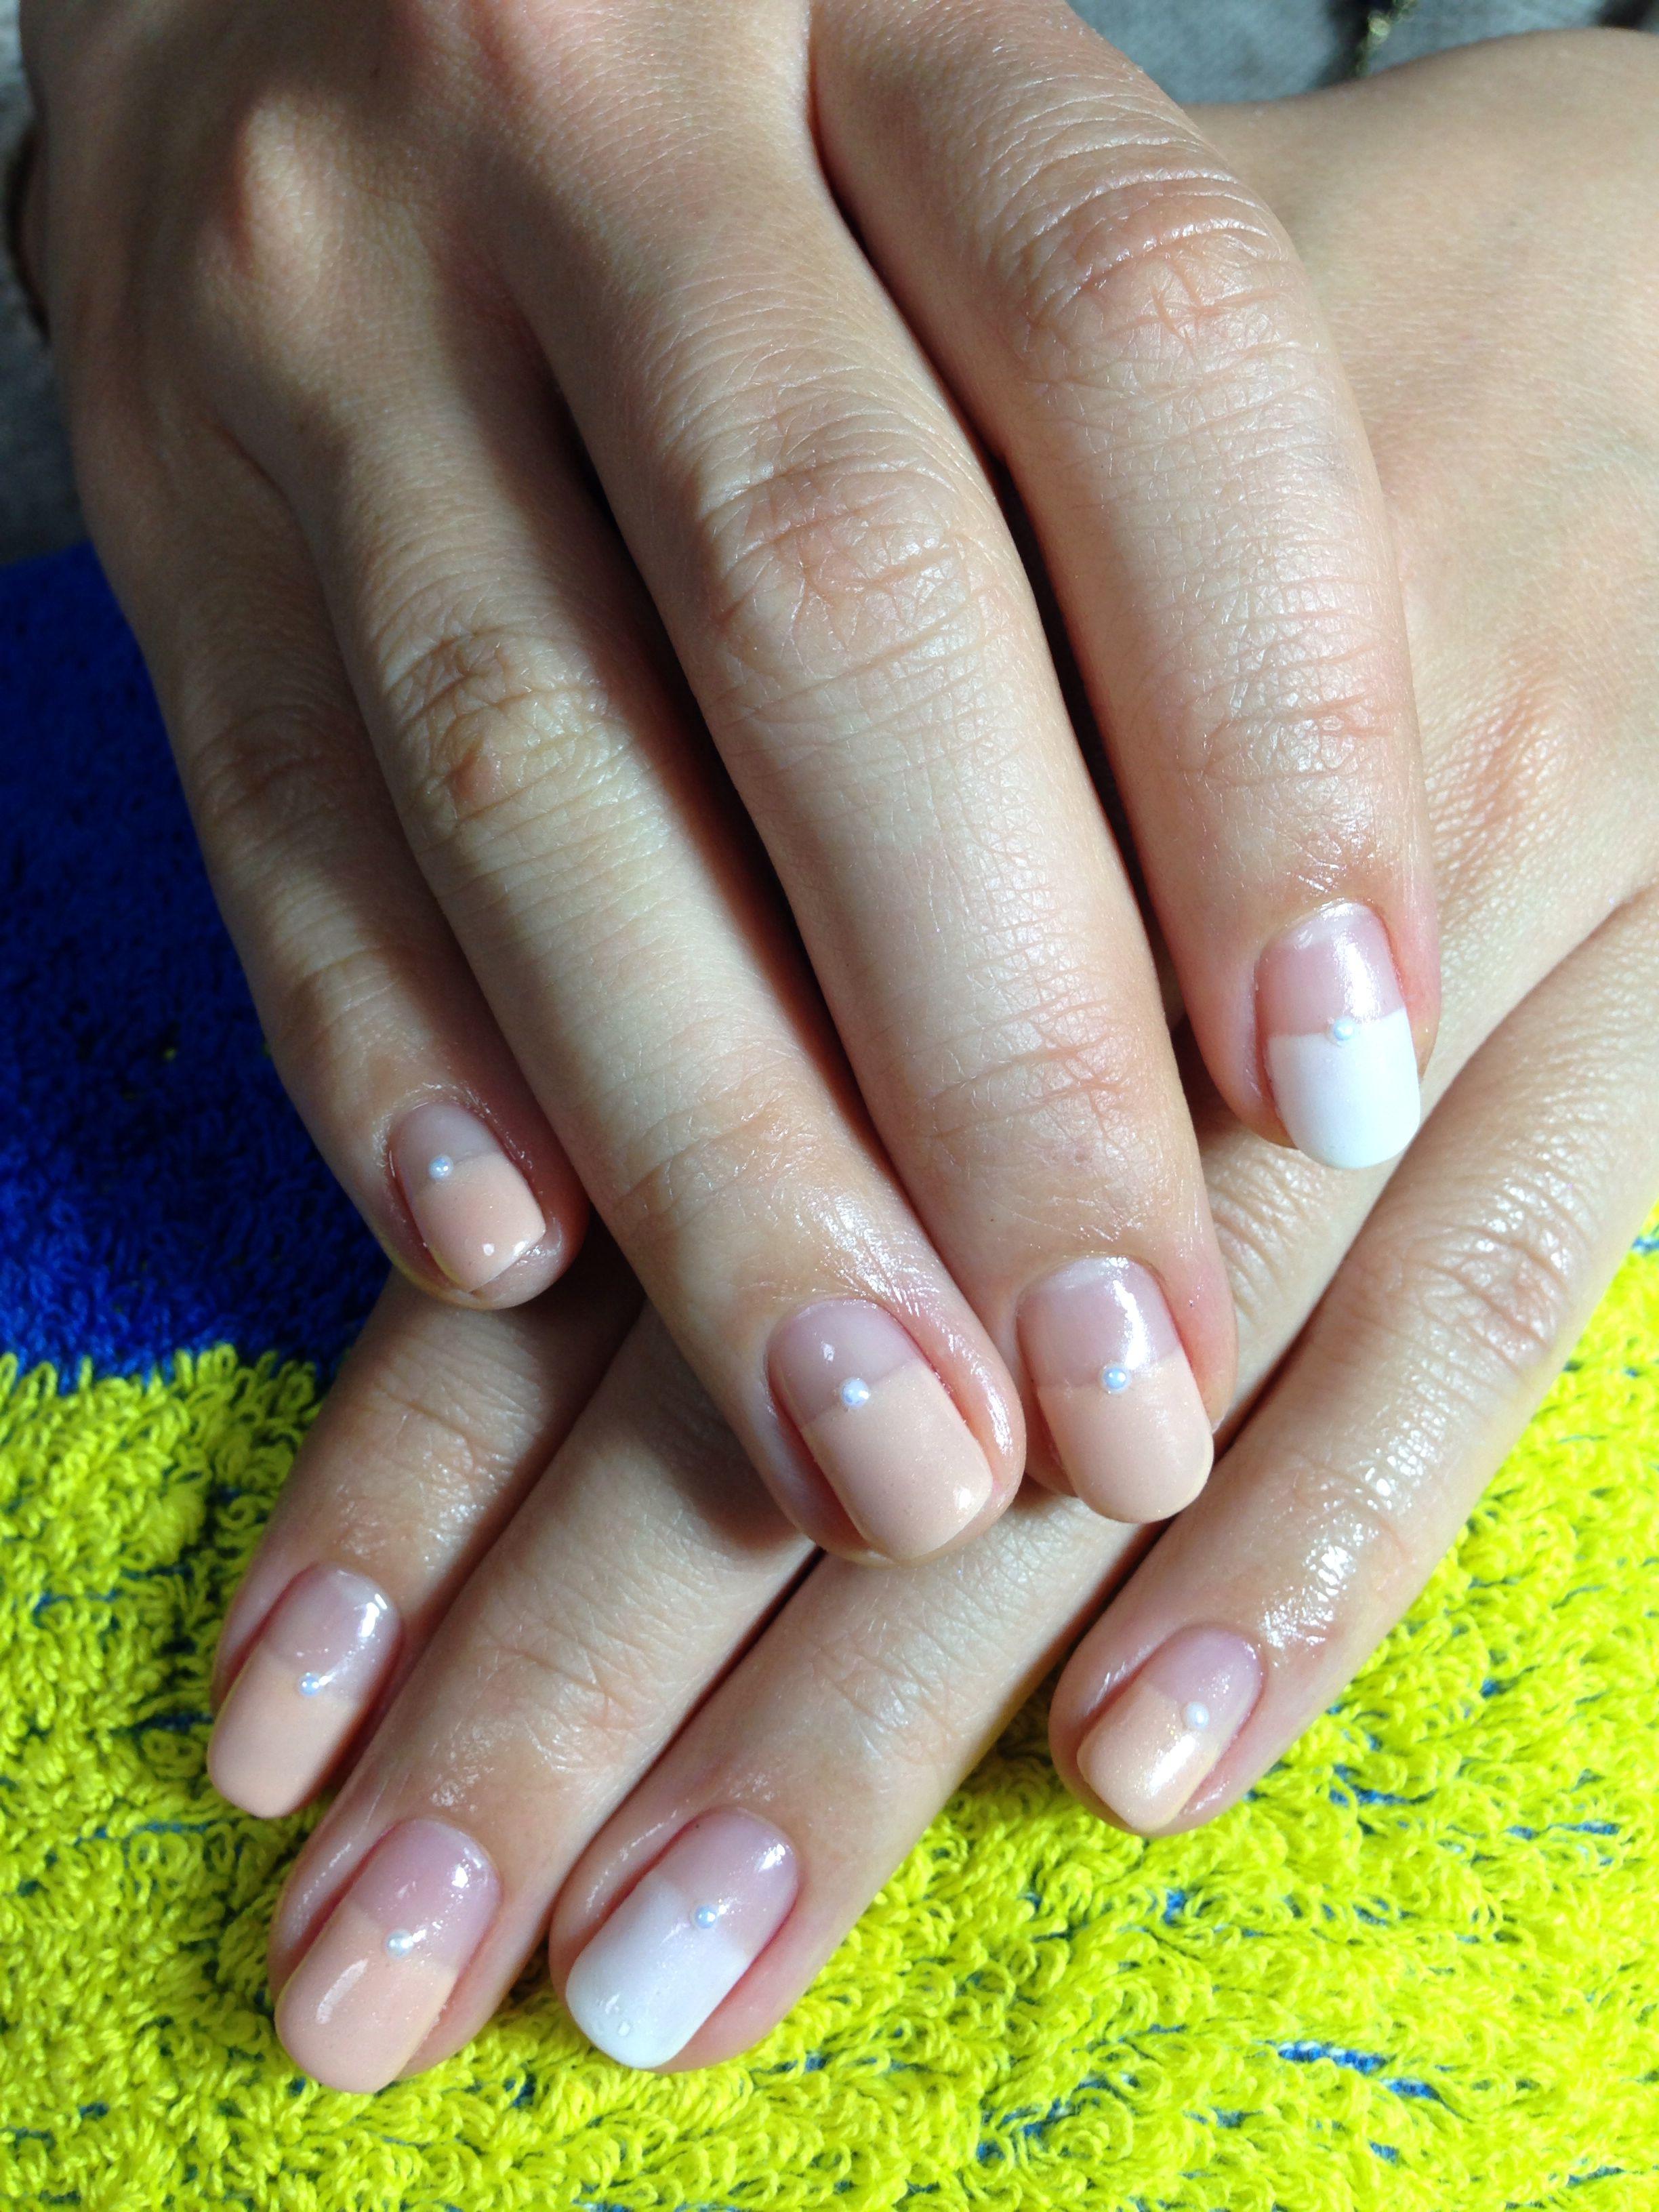 Straight Line Nail Art : Elegant straight line french nails kana pinterest